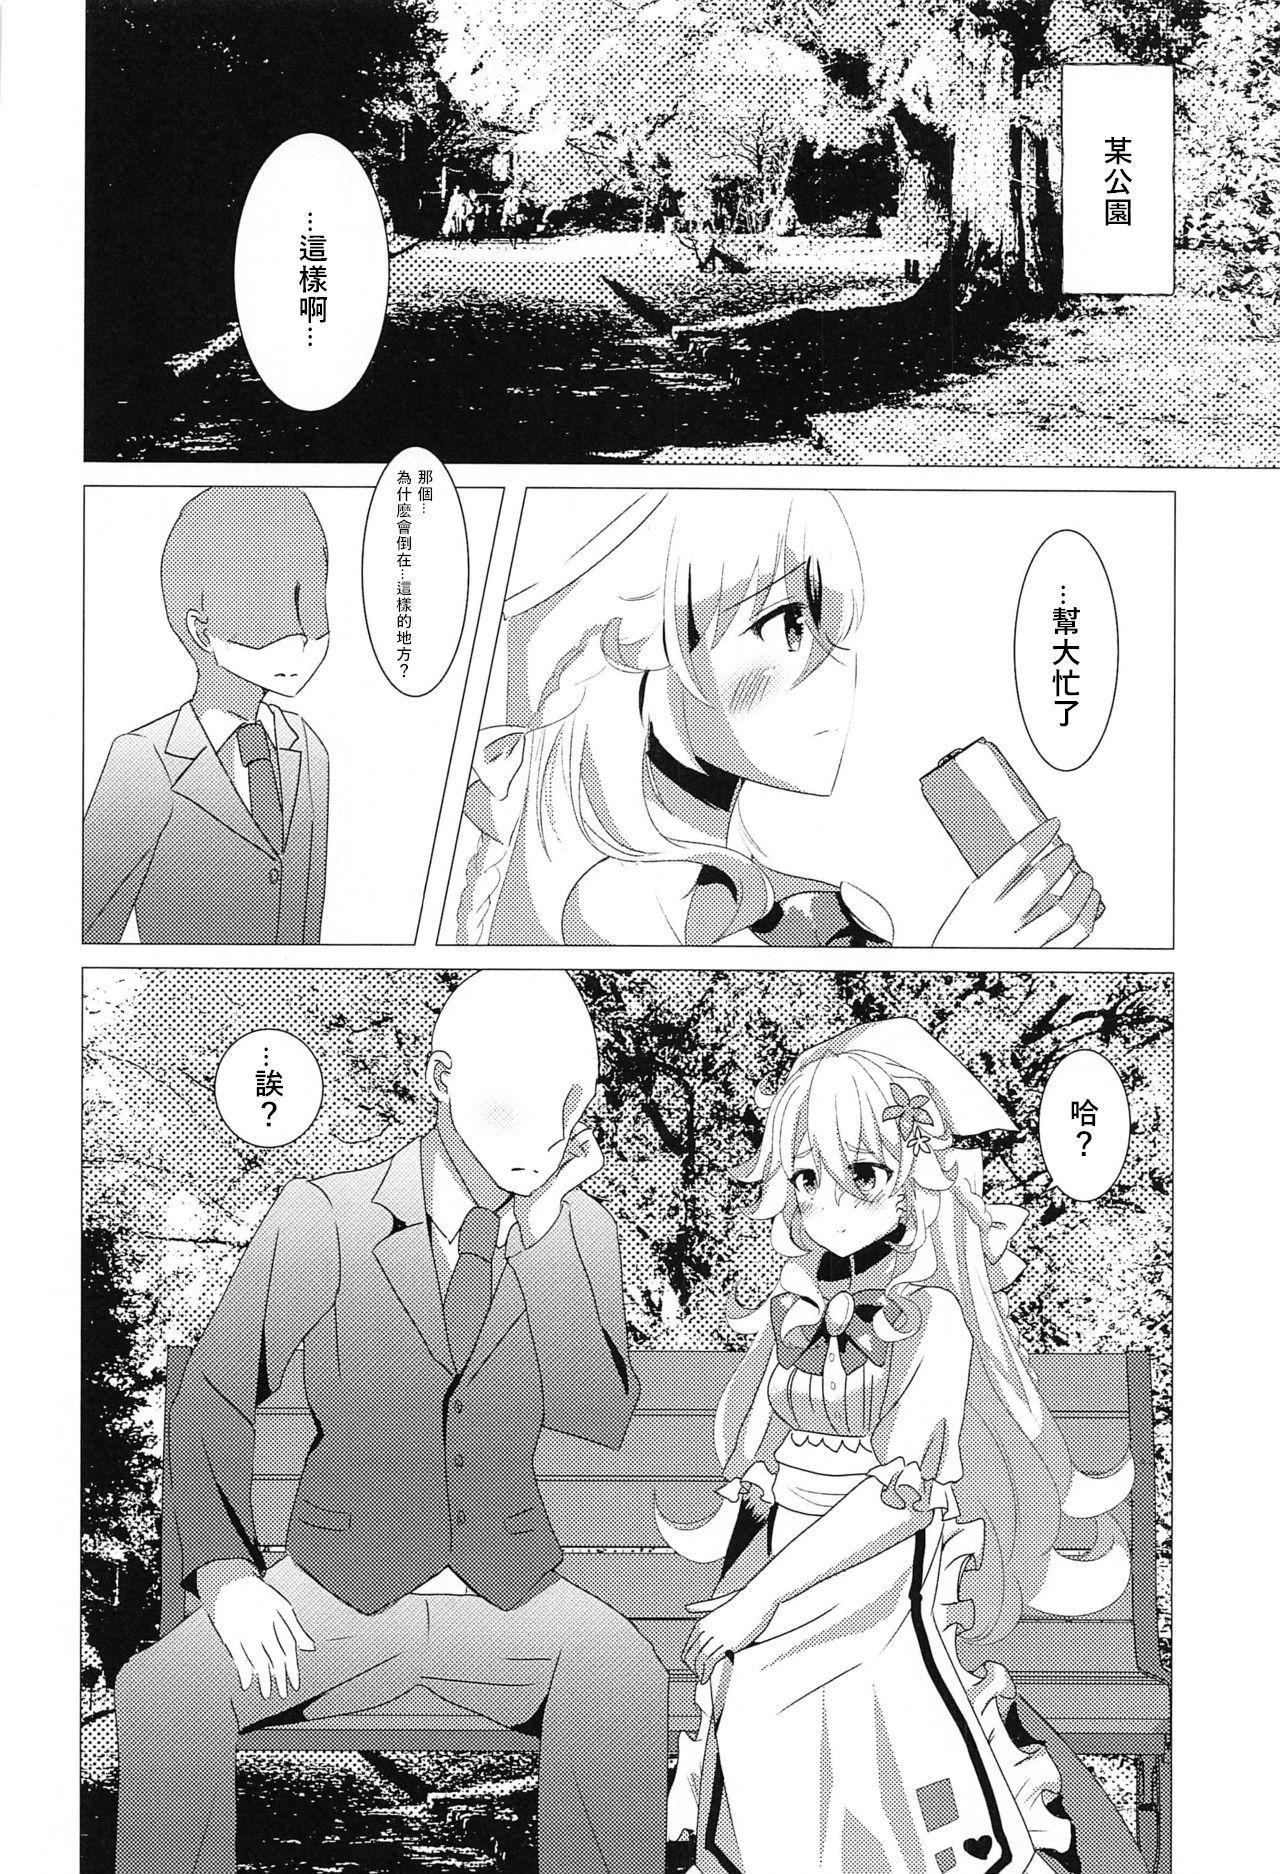 wagamamaerachiowakarasetai! 3